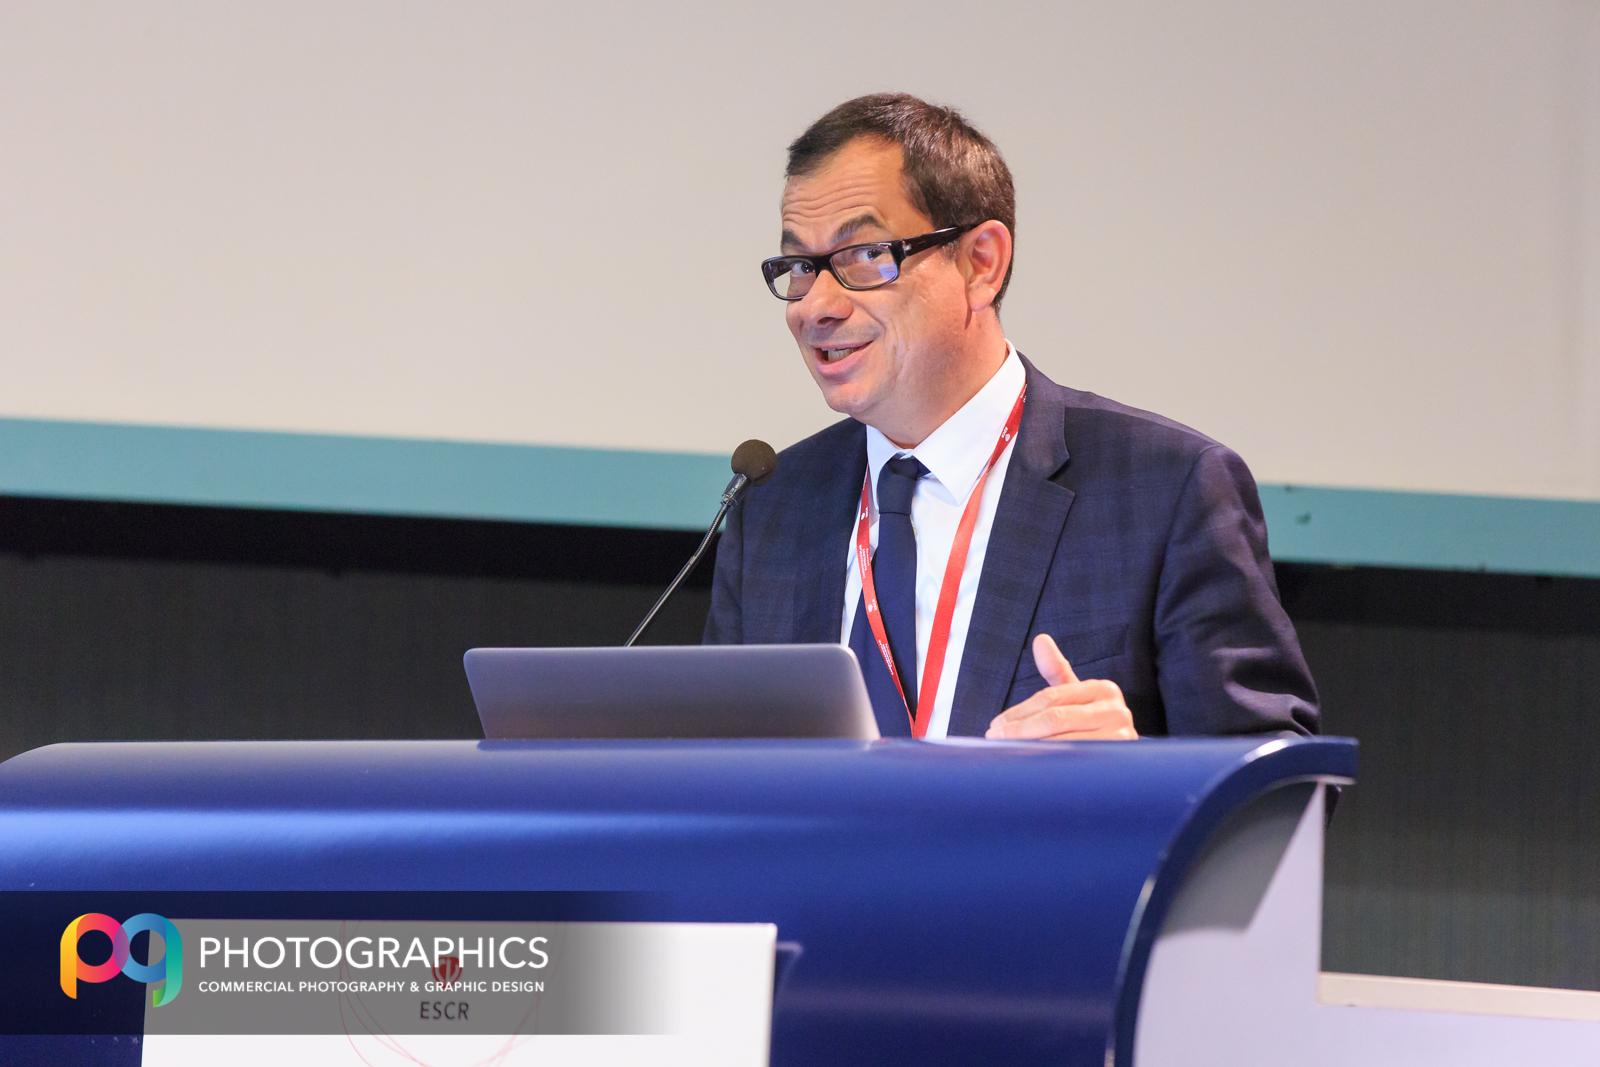 ESCR-2018-conference-event-photography-UK-glasgow-edinburgh-20.jpg